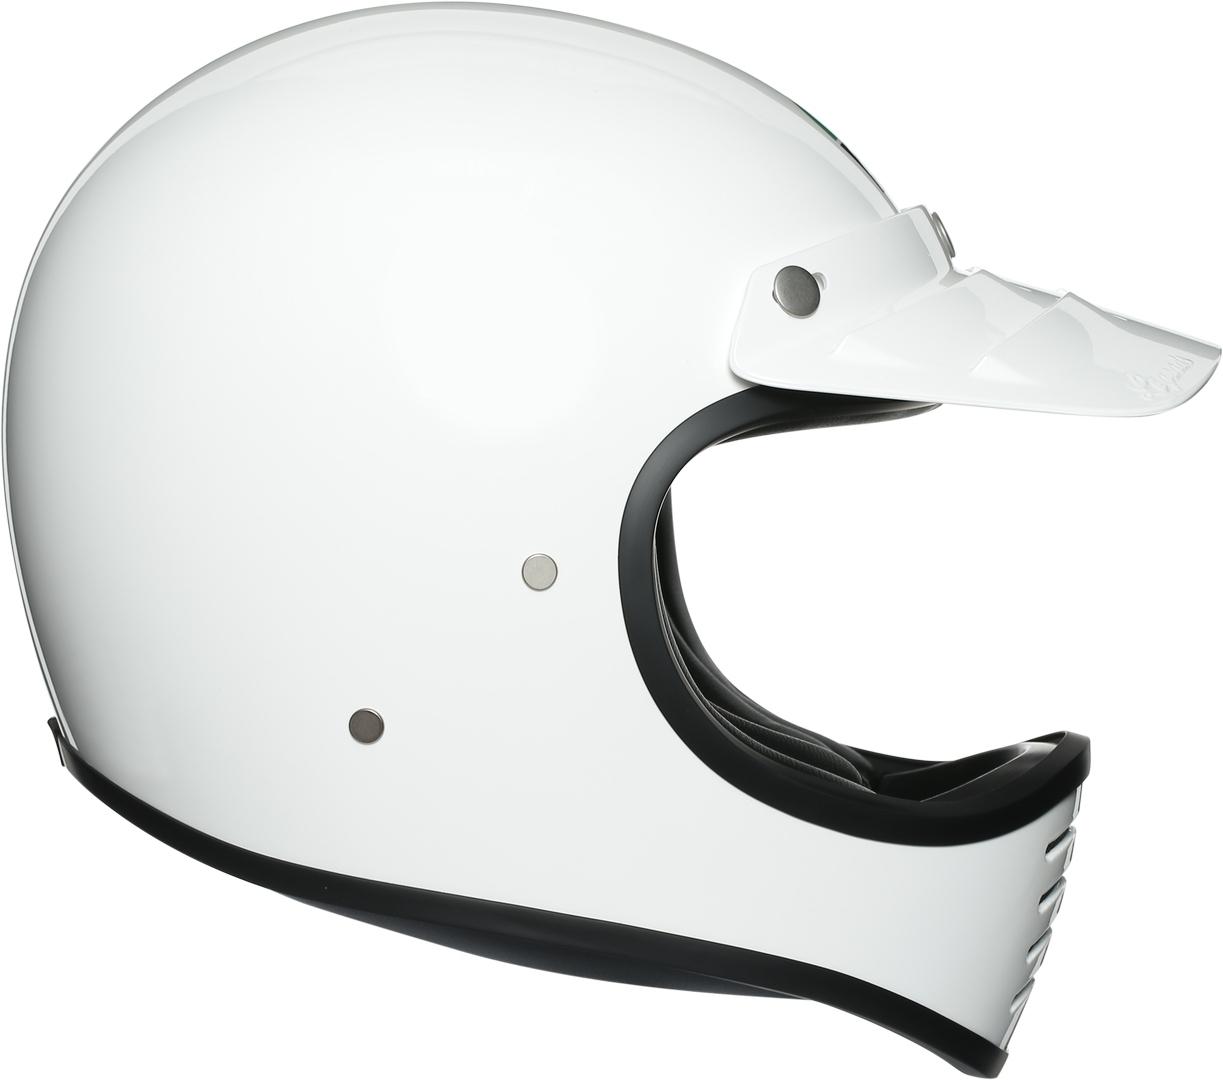 AGV Legends X101 Helm, weiss, Größe XL, weiss, Größe XL